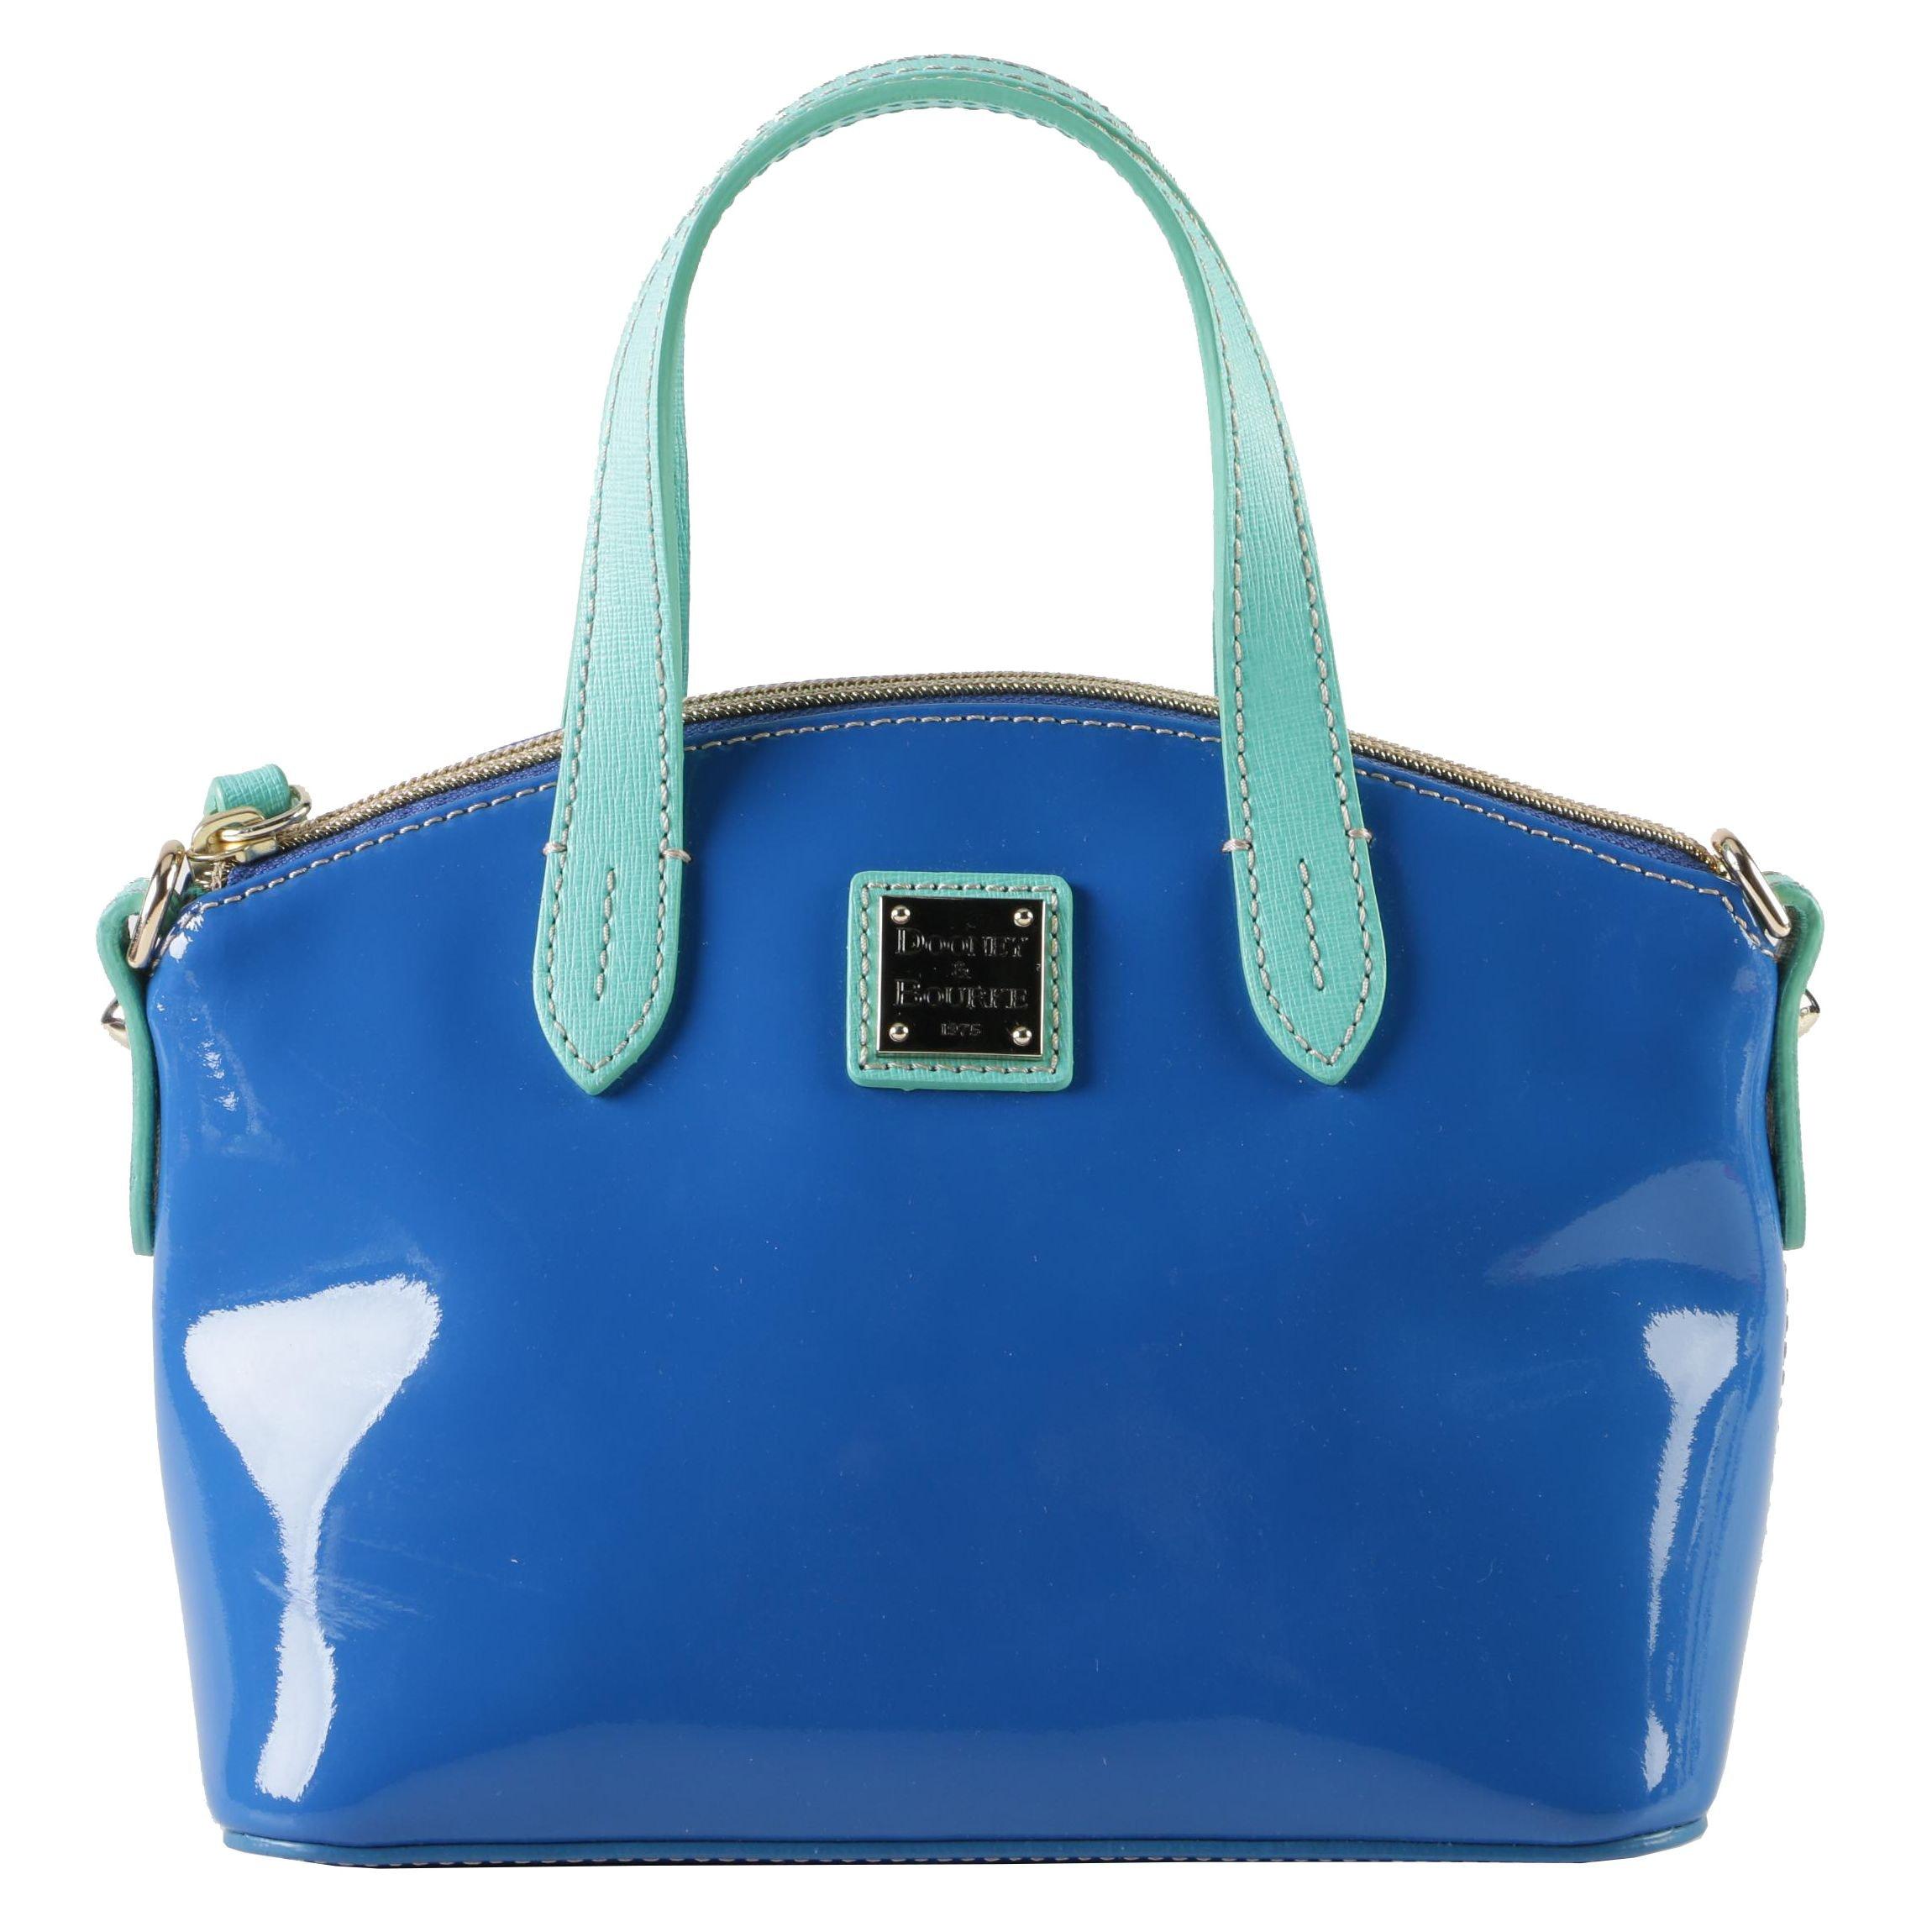 Dooney & Bourke Blue and Aqua Patent Leather Handbag with Shoulder Strap